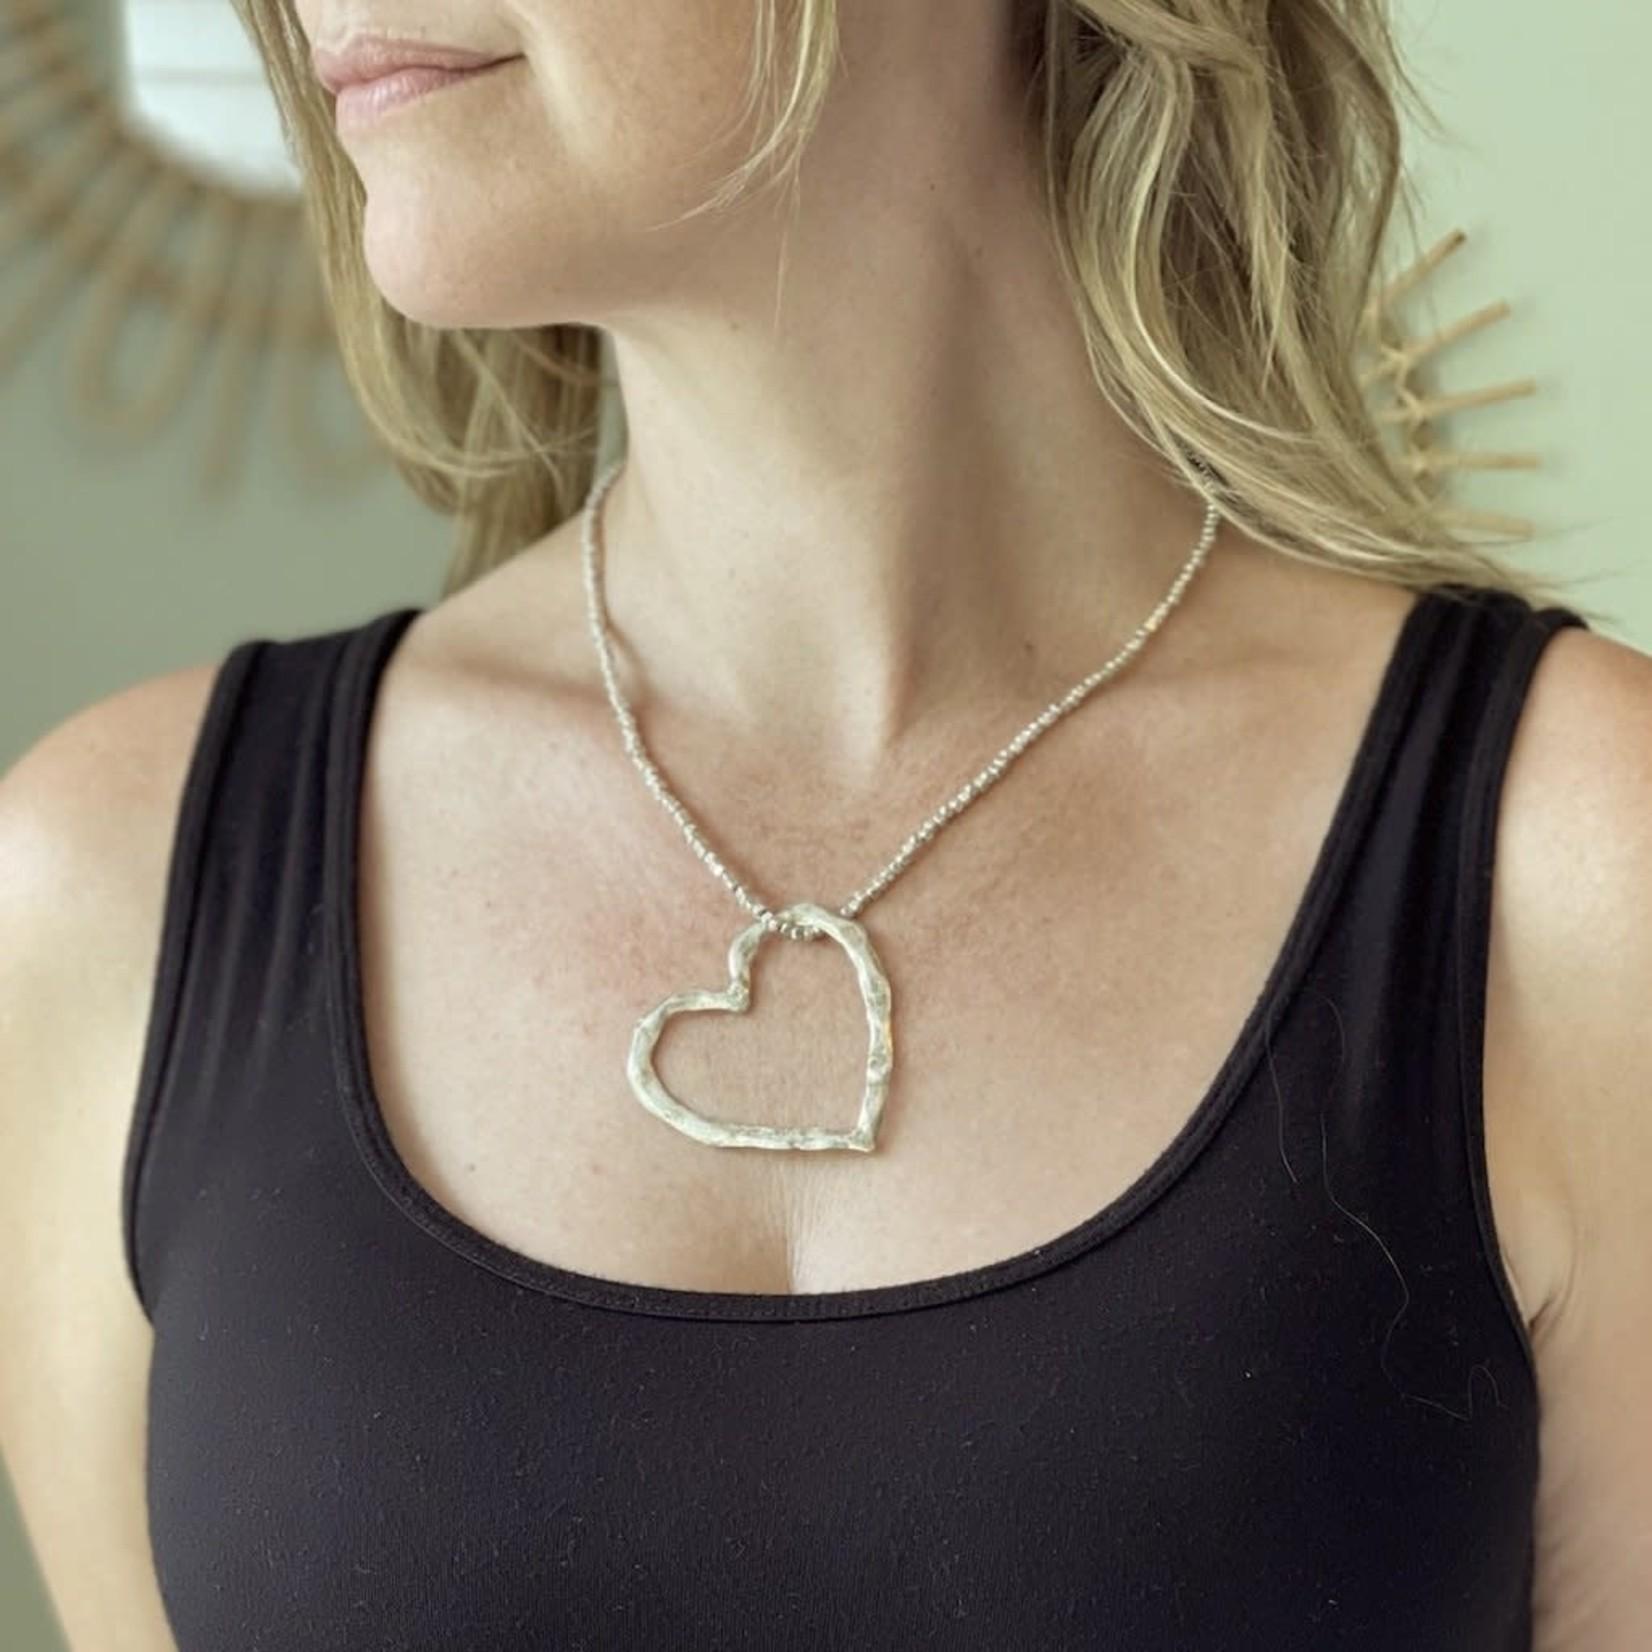 Suzie Blue Canada Open Heart Necklace in Silver Plate